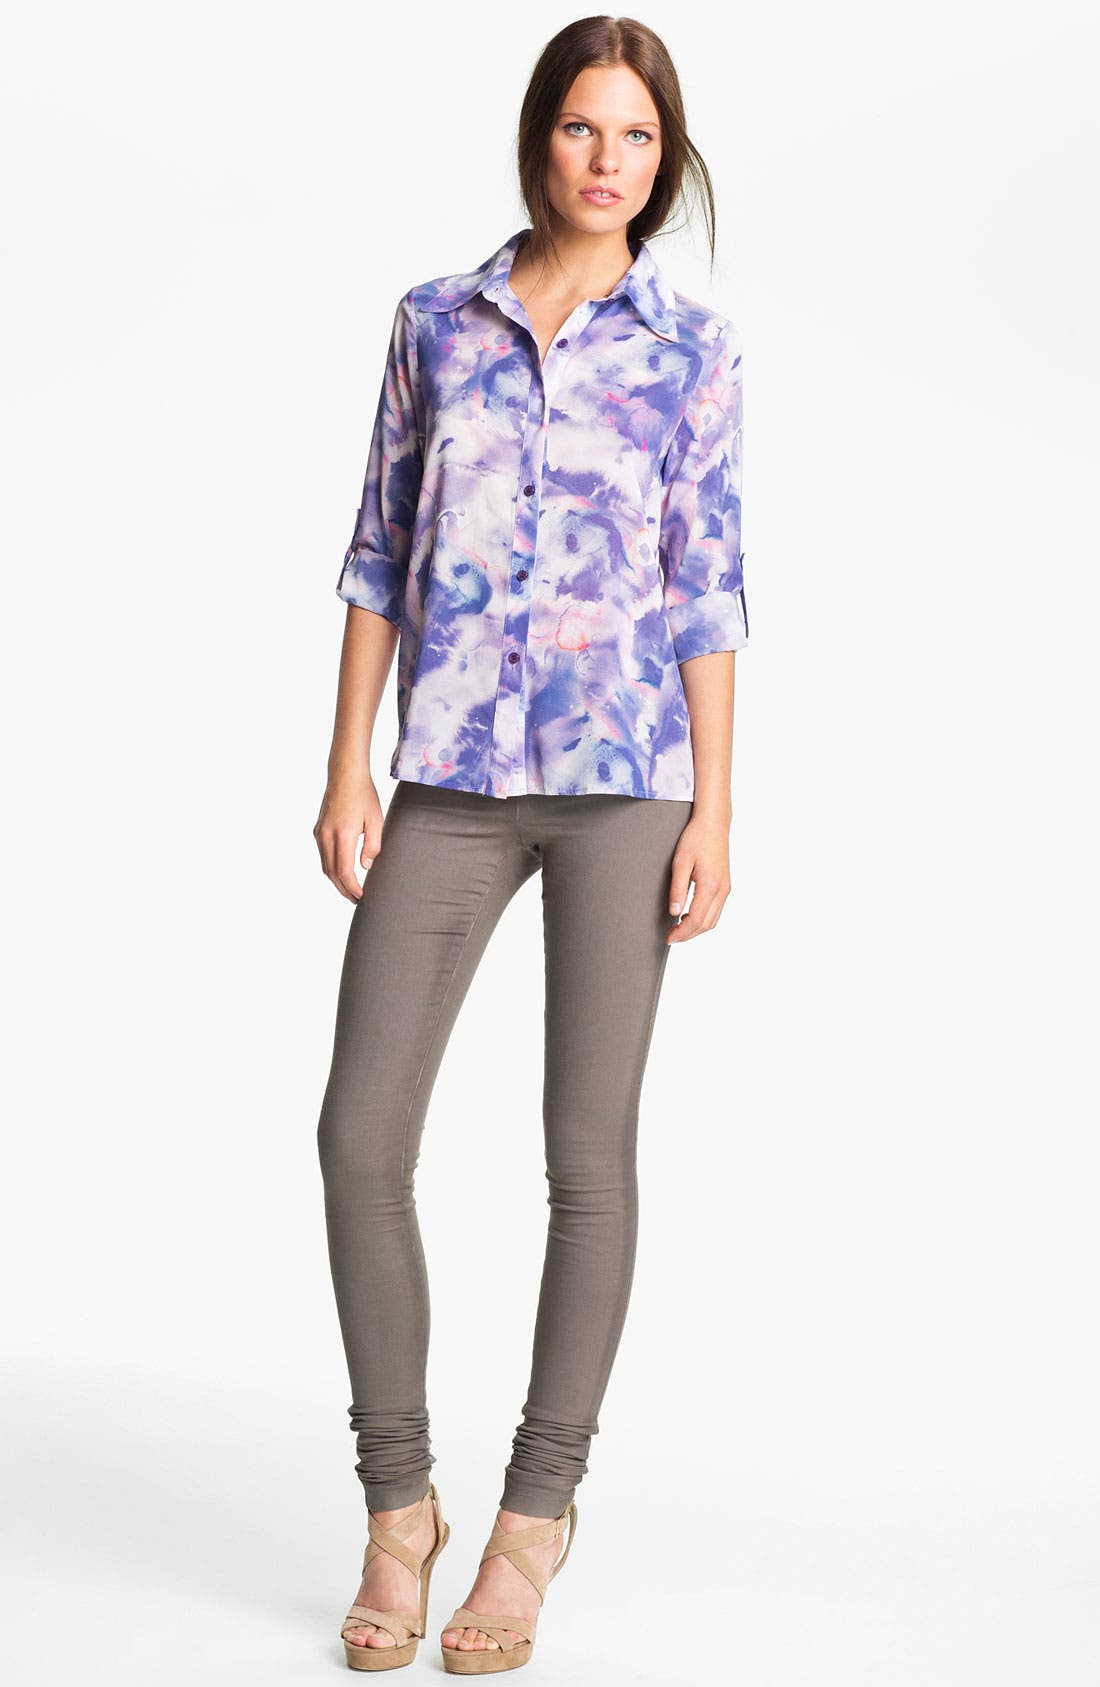 Alternate Image 1 Selected - Alice + Olivia 'Juliette' Tie Dye Stretch Silk Shirt